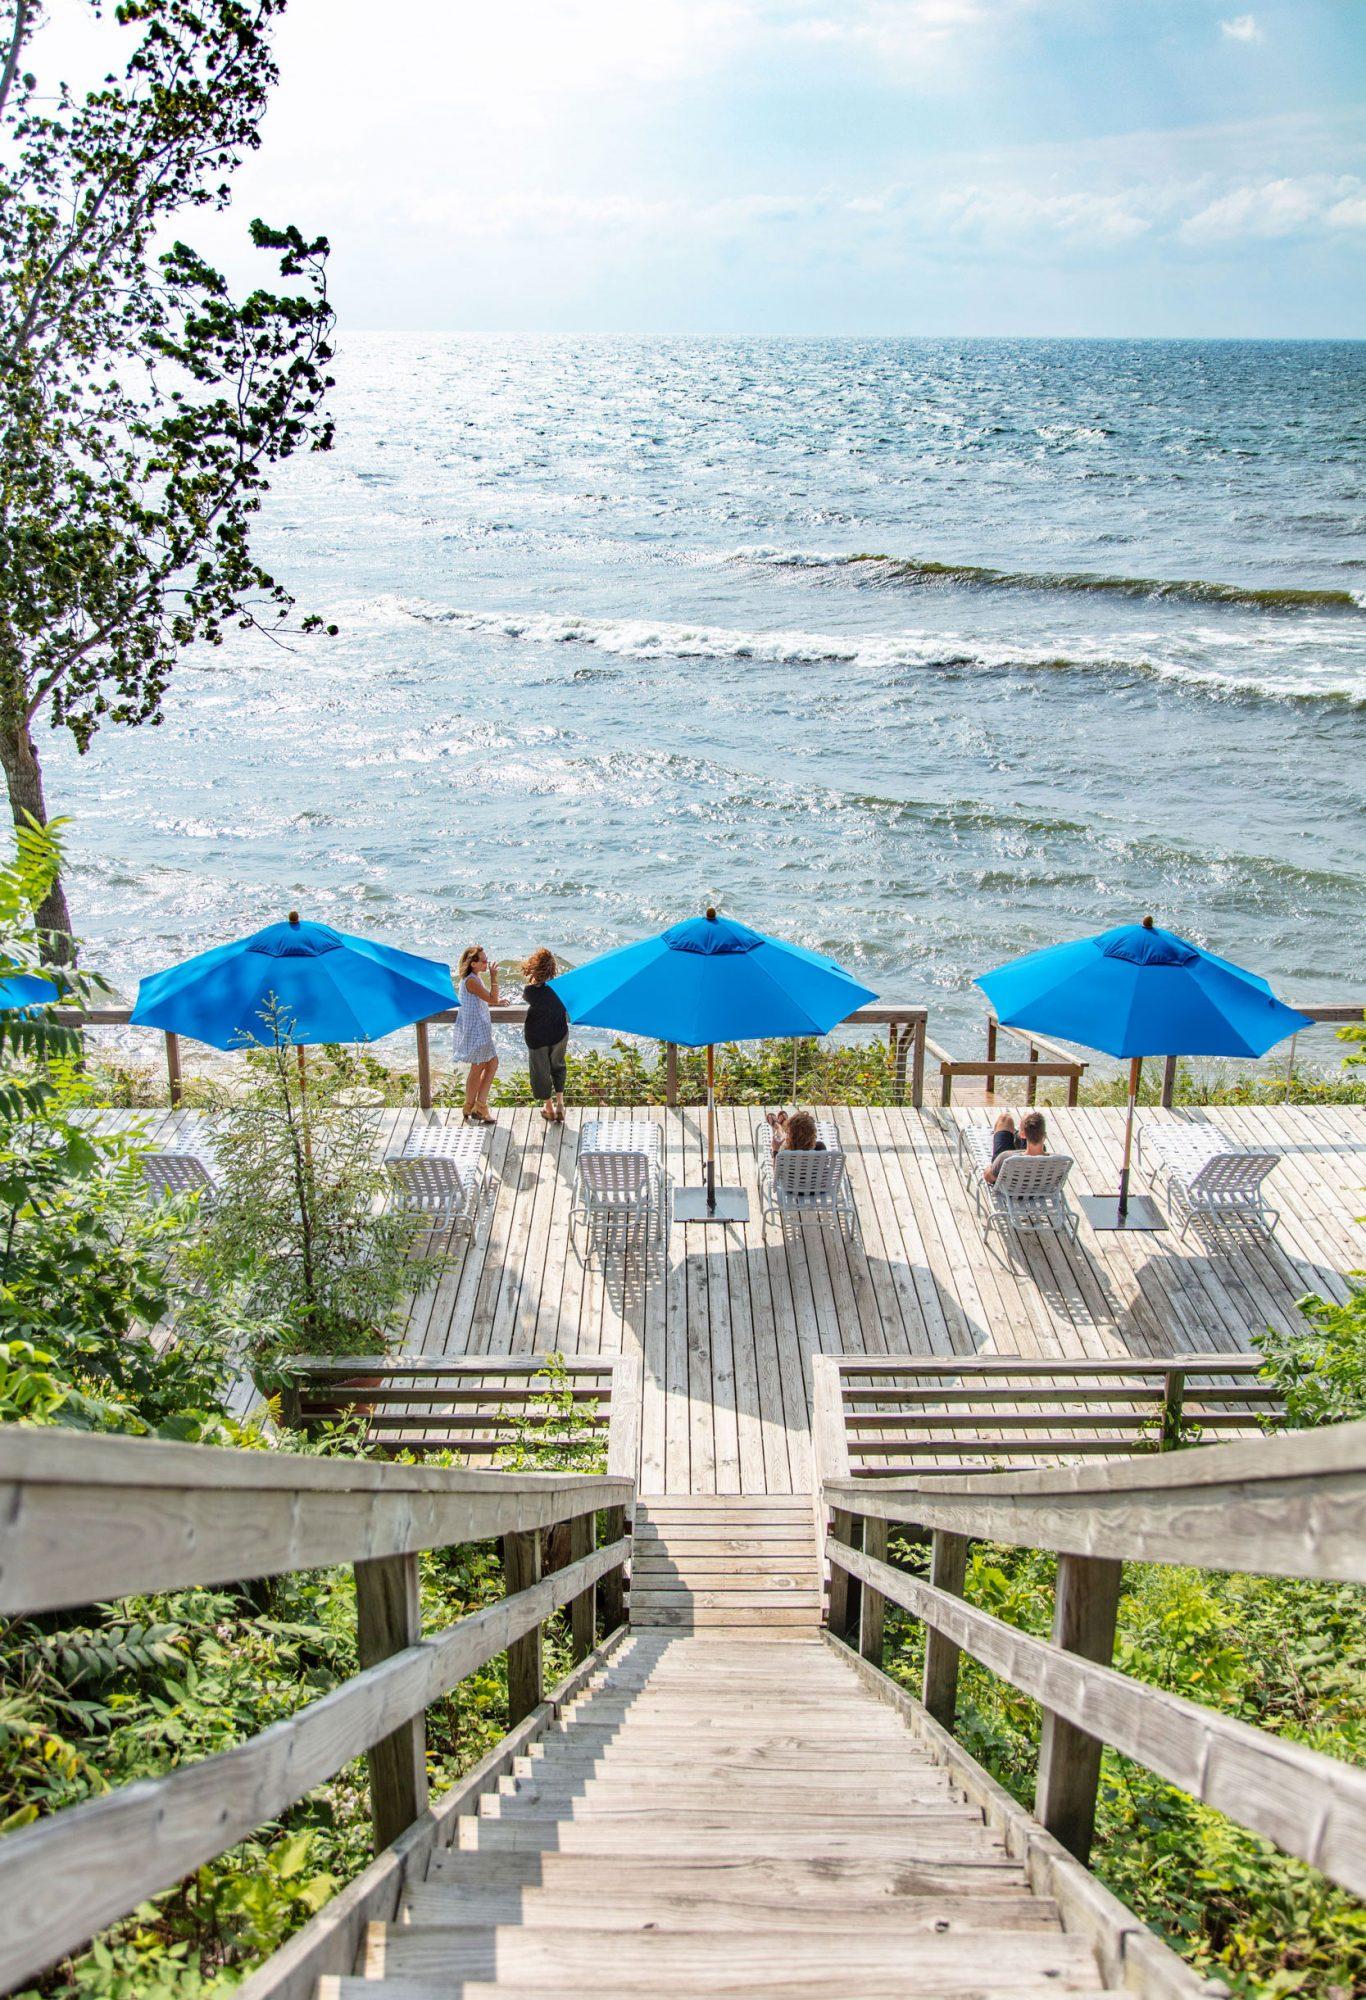 Midwest resort revival